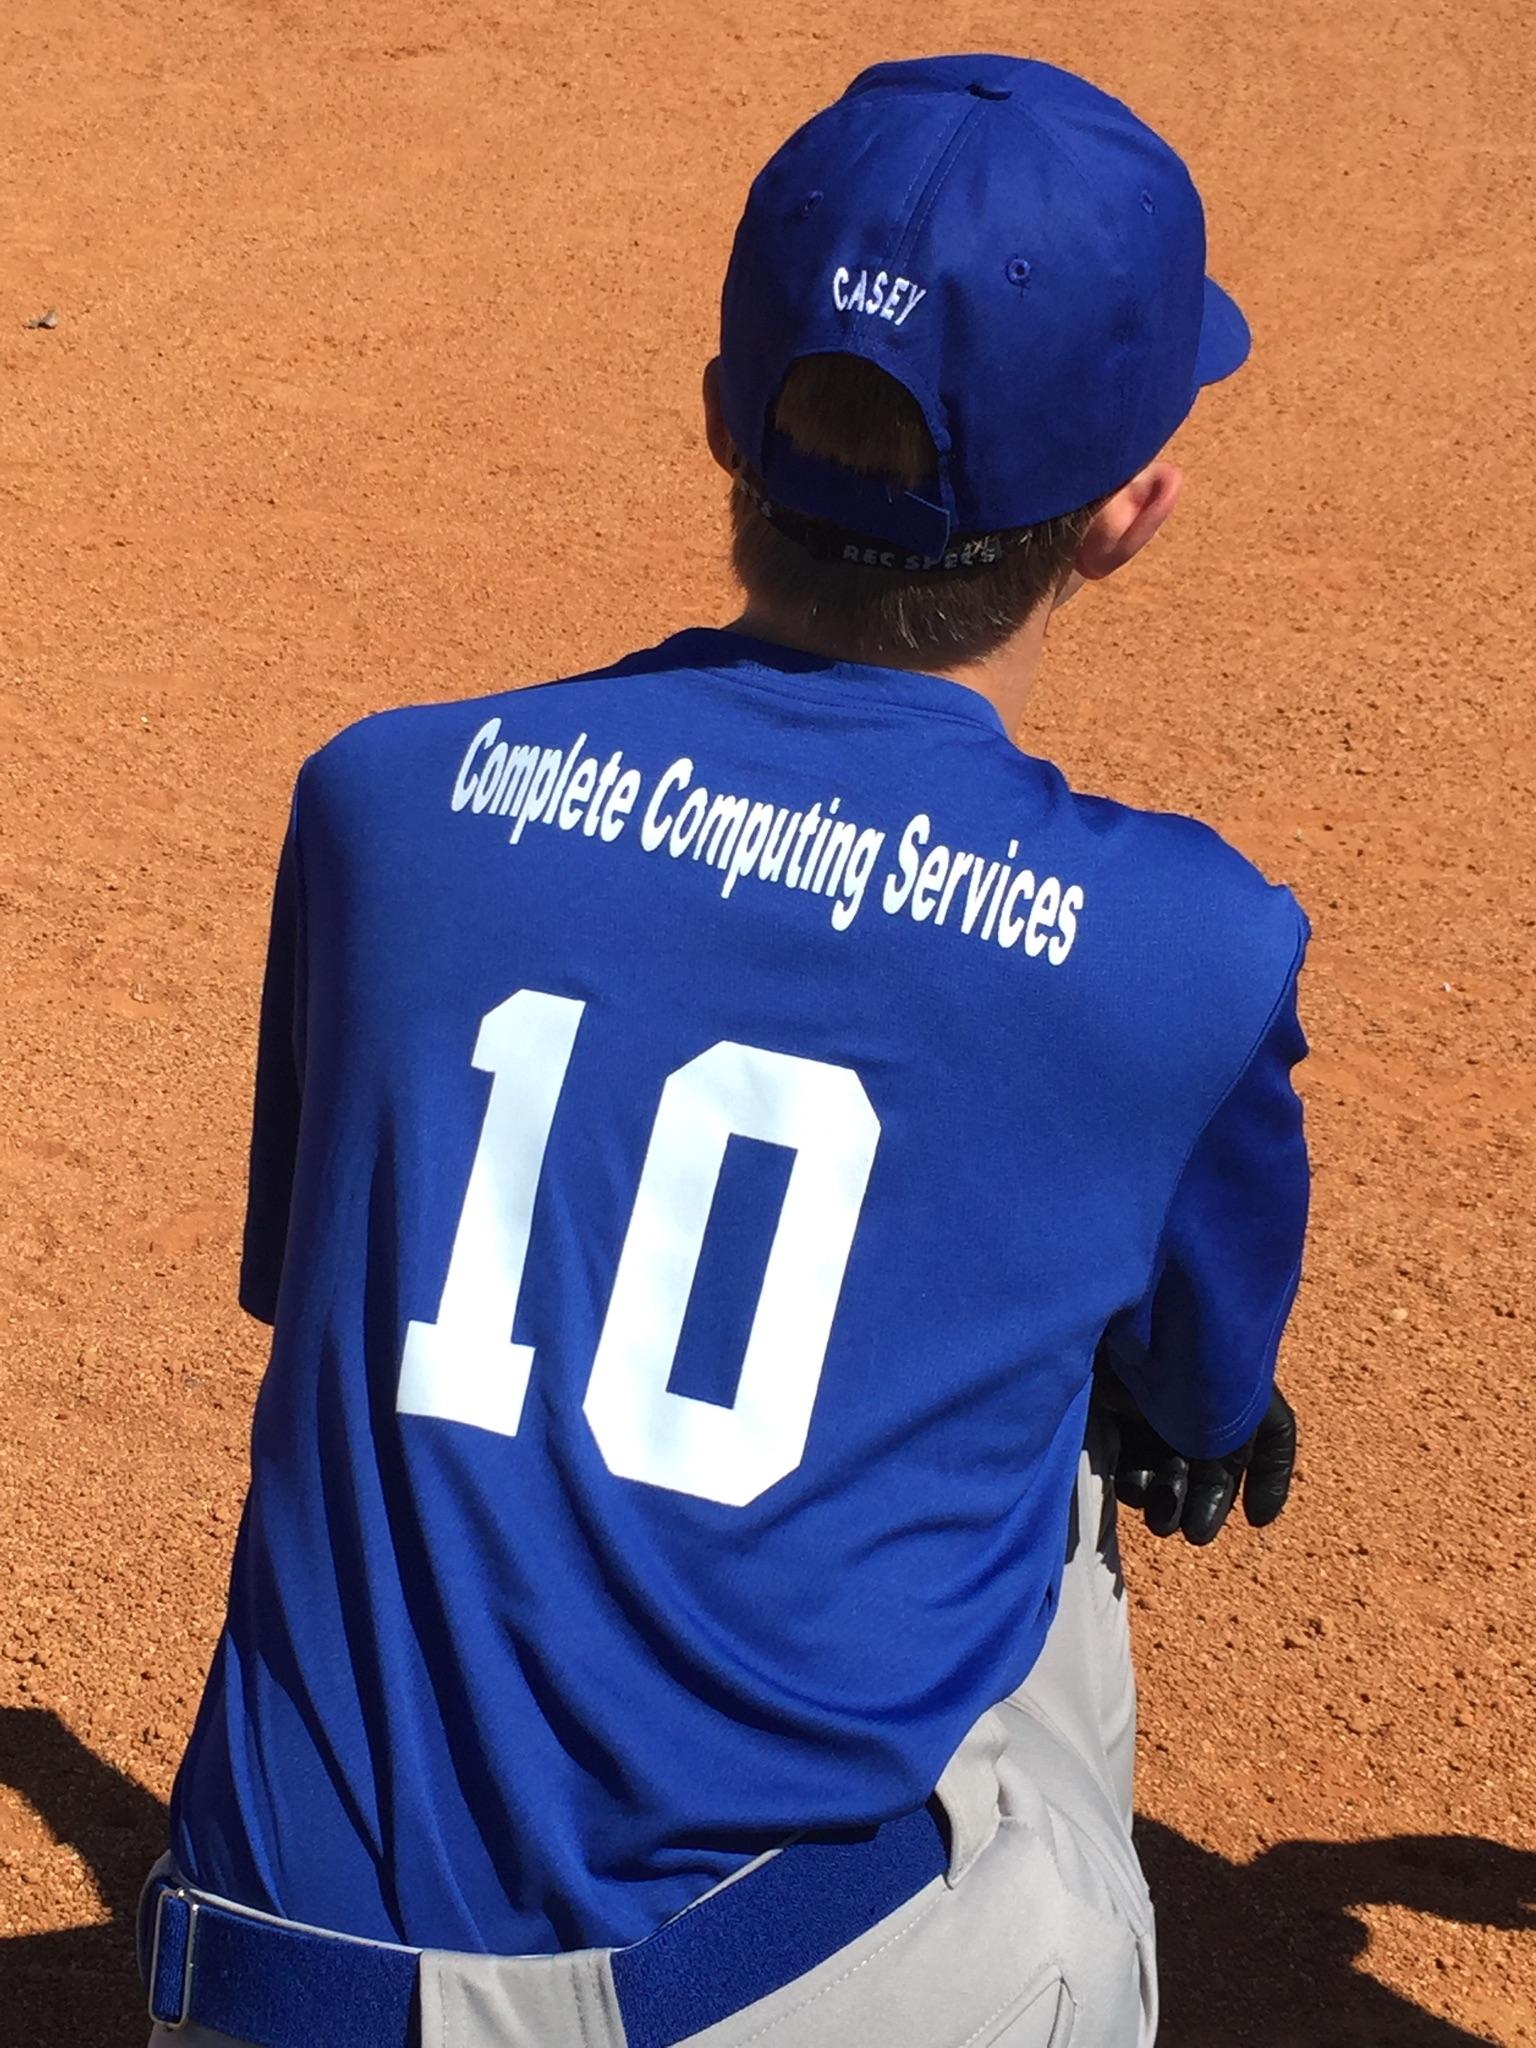 CCS sponsors the TSA Blue Jays baseball team